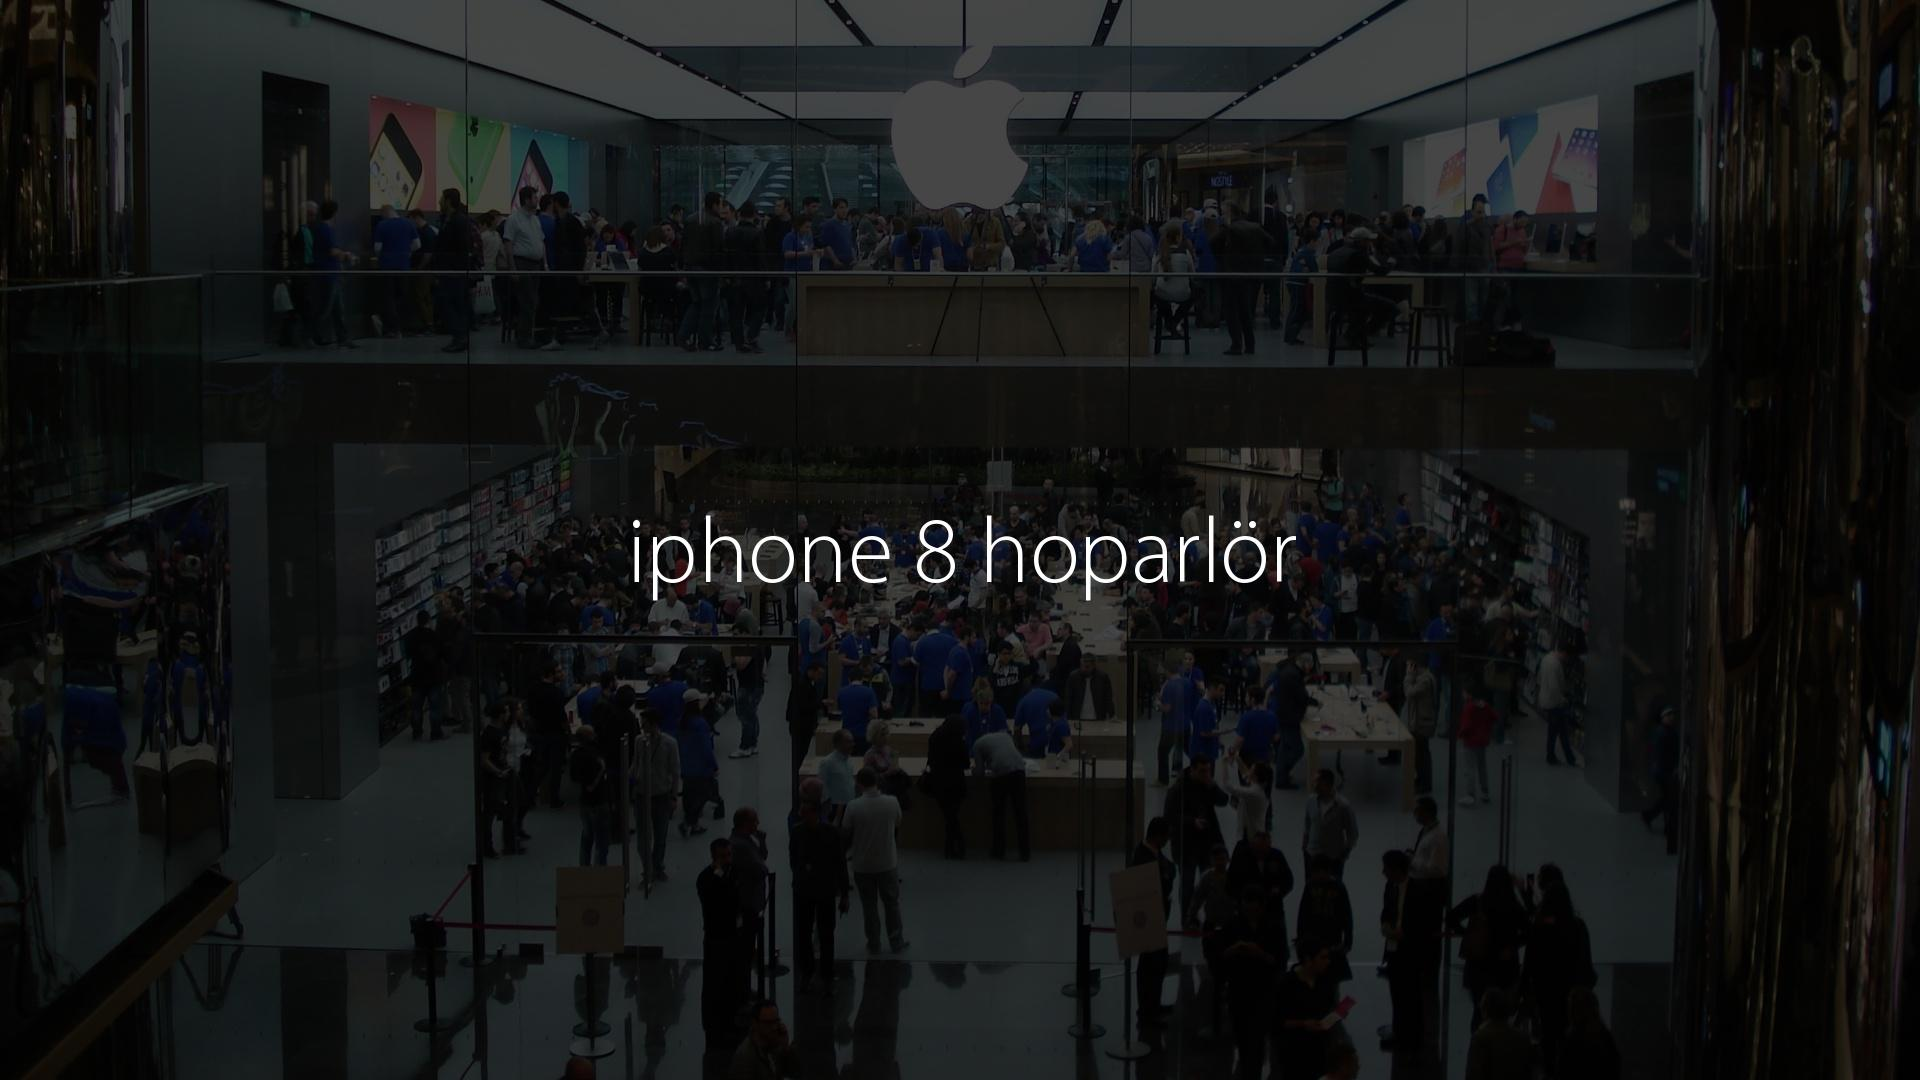 iphone 8 hoparlör